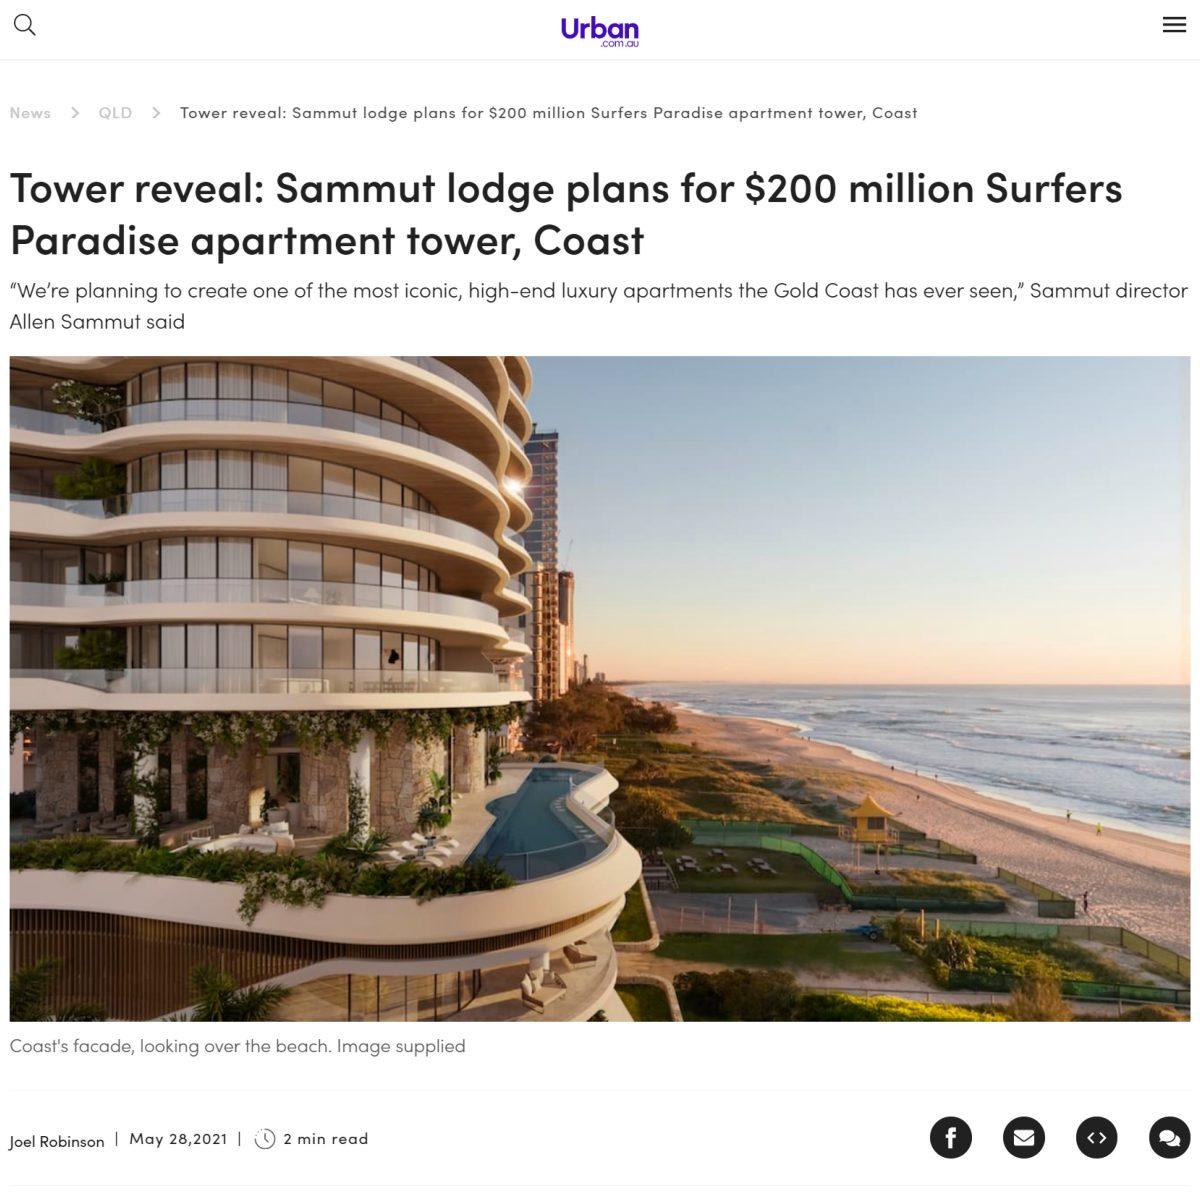 Tower reveal: Sammut lodge plans for $200 million Surfers Paradise apartment tower, Coast